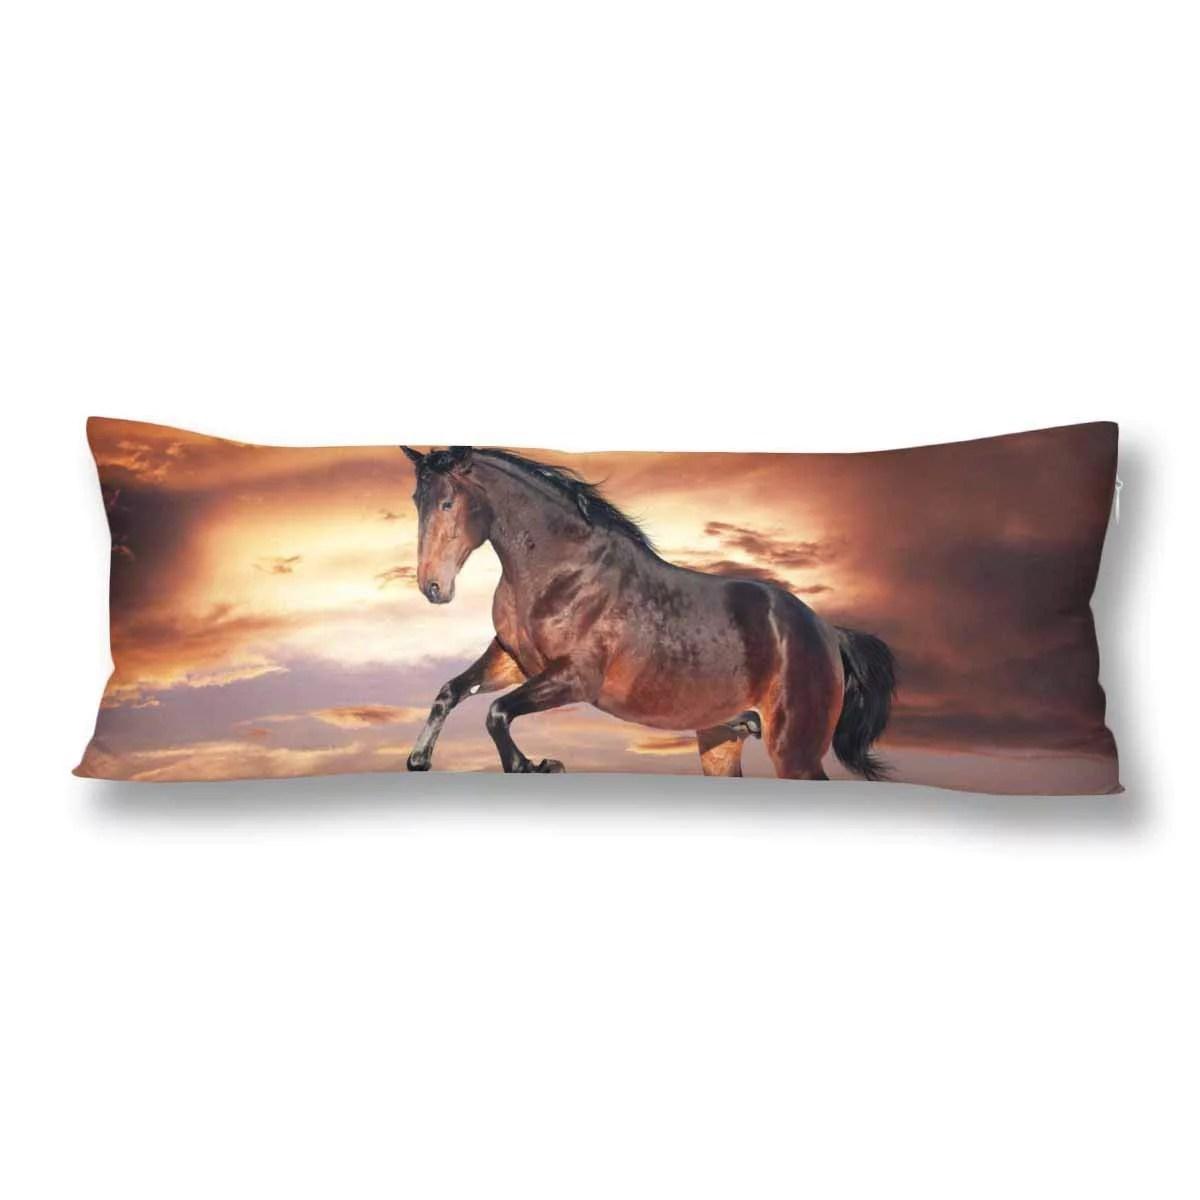 abphoto brown horse running body pillow covers pillowcase 20x60 inch dark sky body pillow case protector walmart com